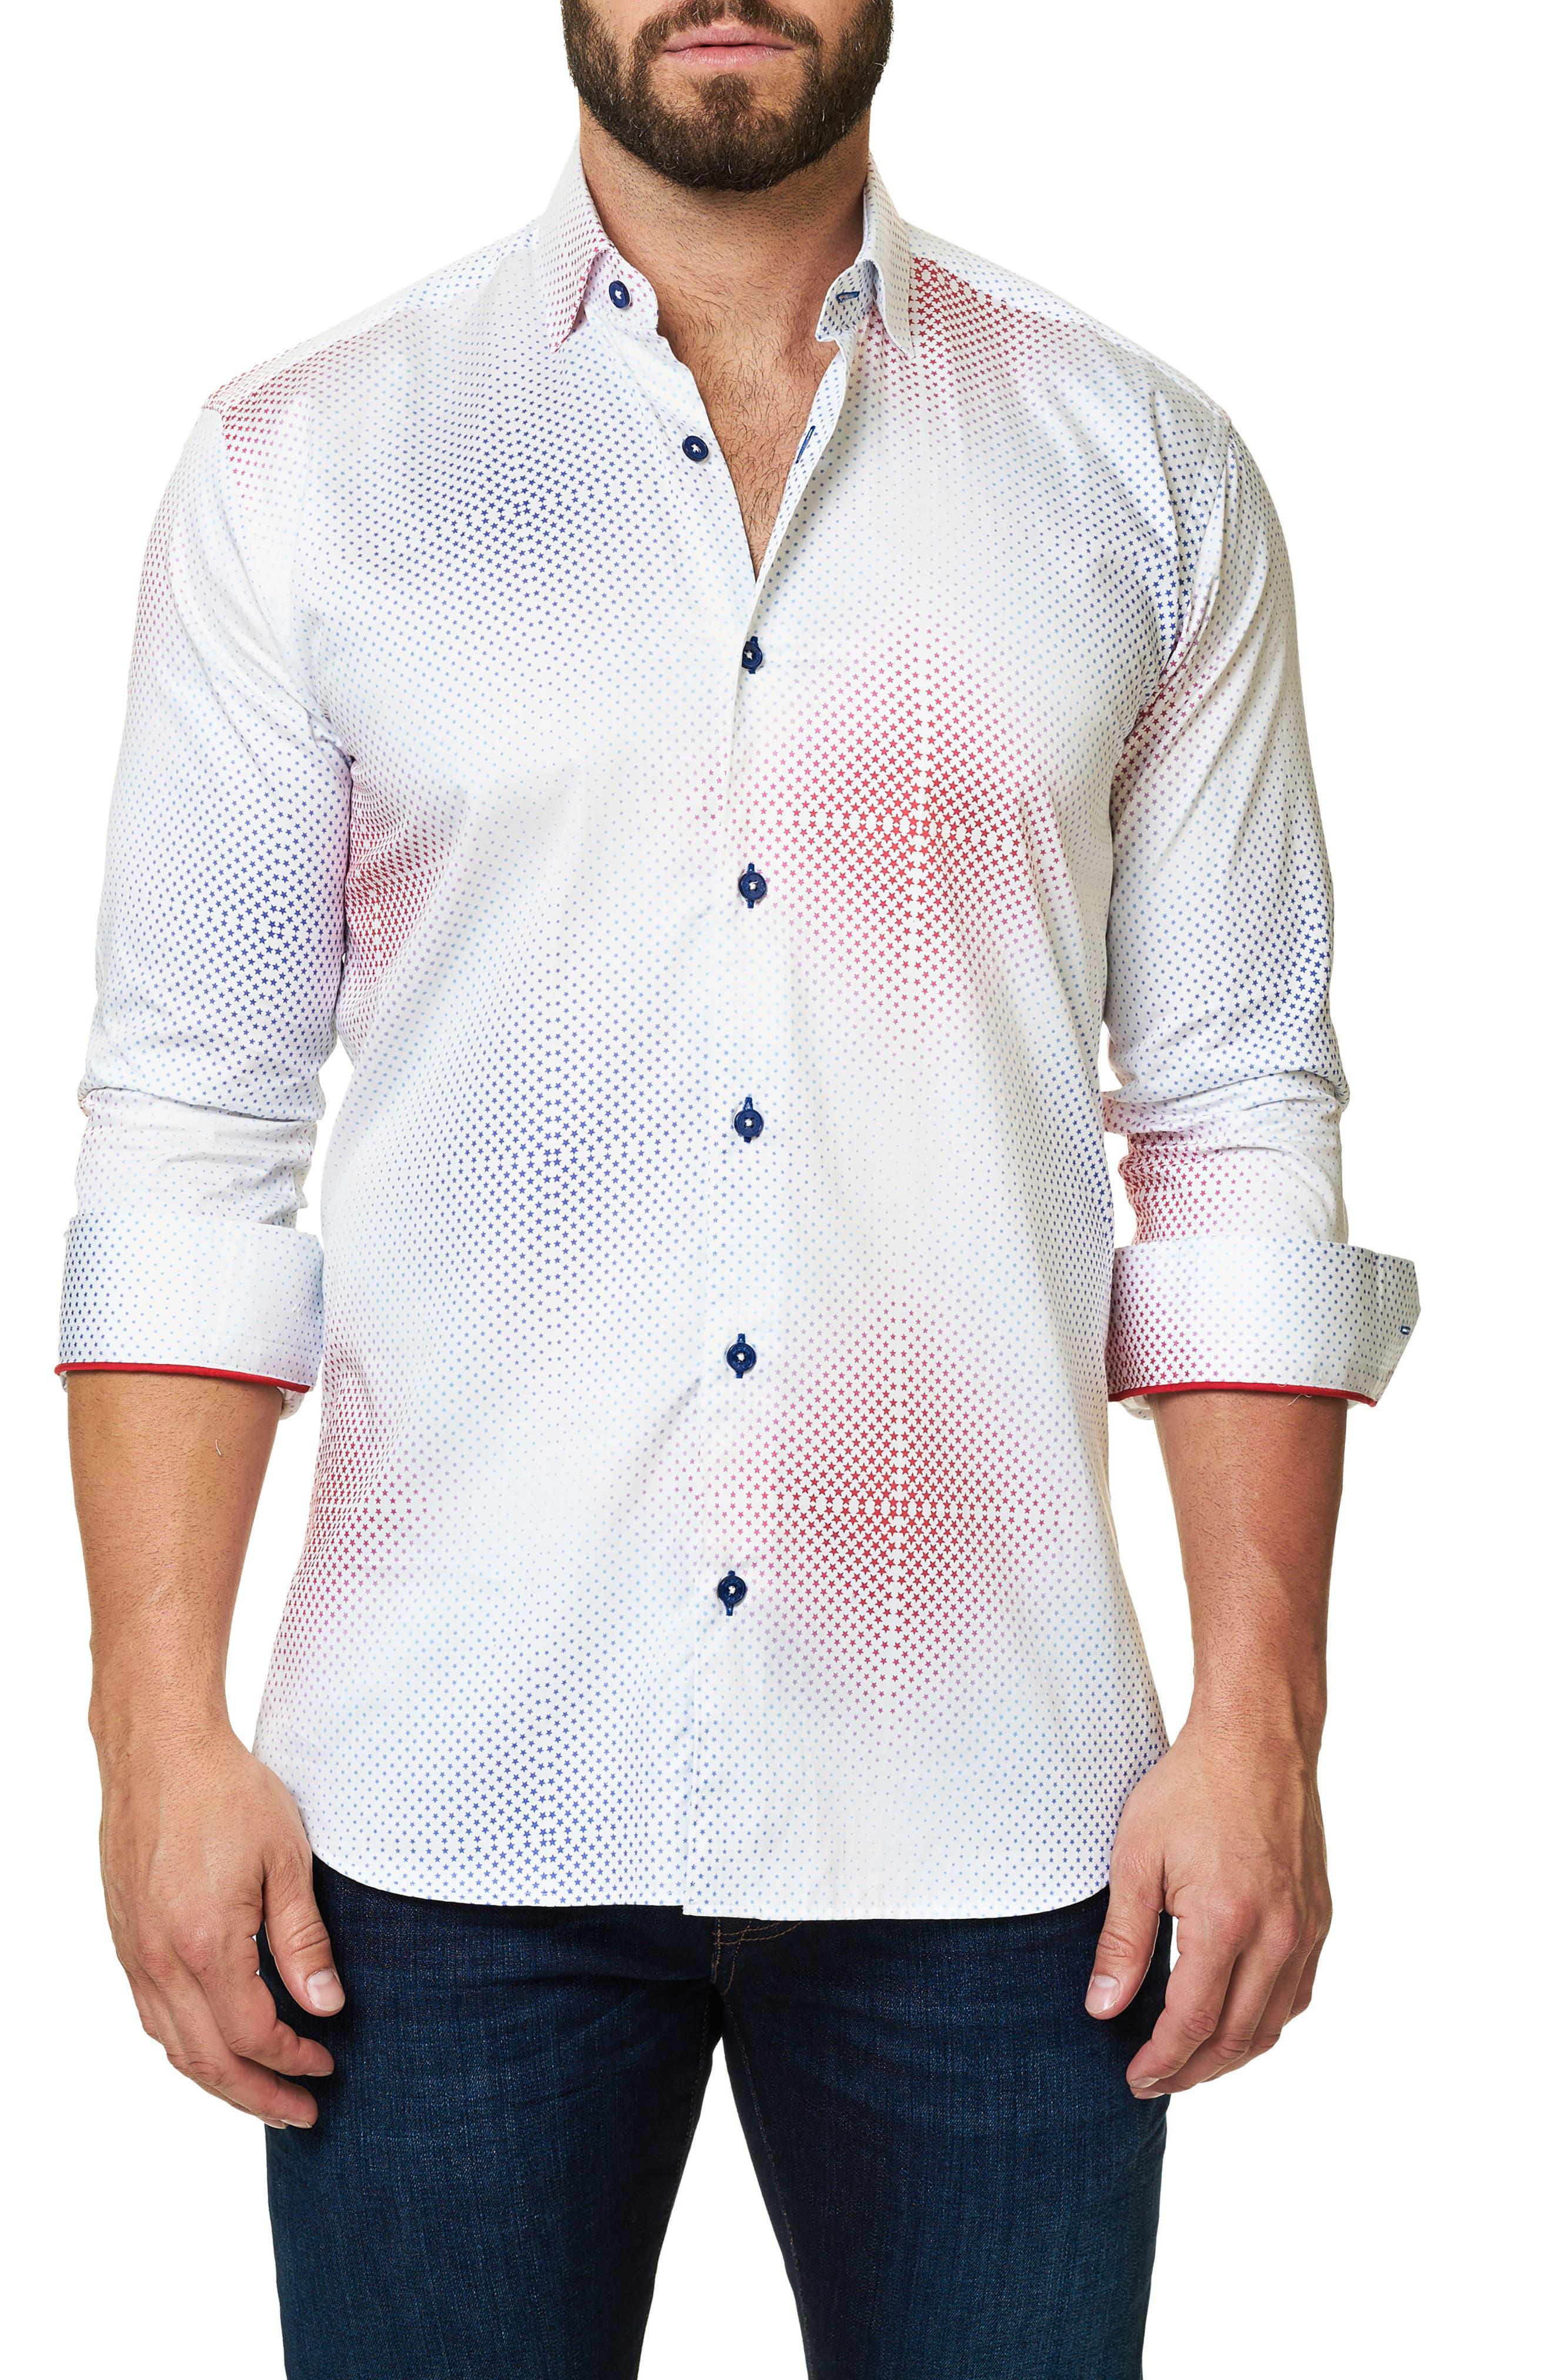 Maceoo Trim Fit Ombré Star Sport Shirt